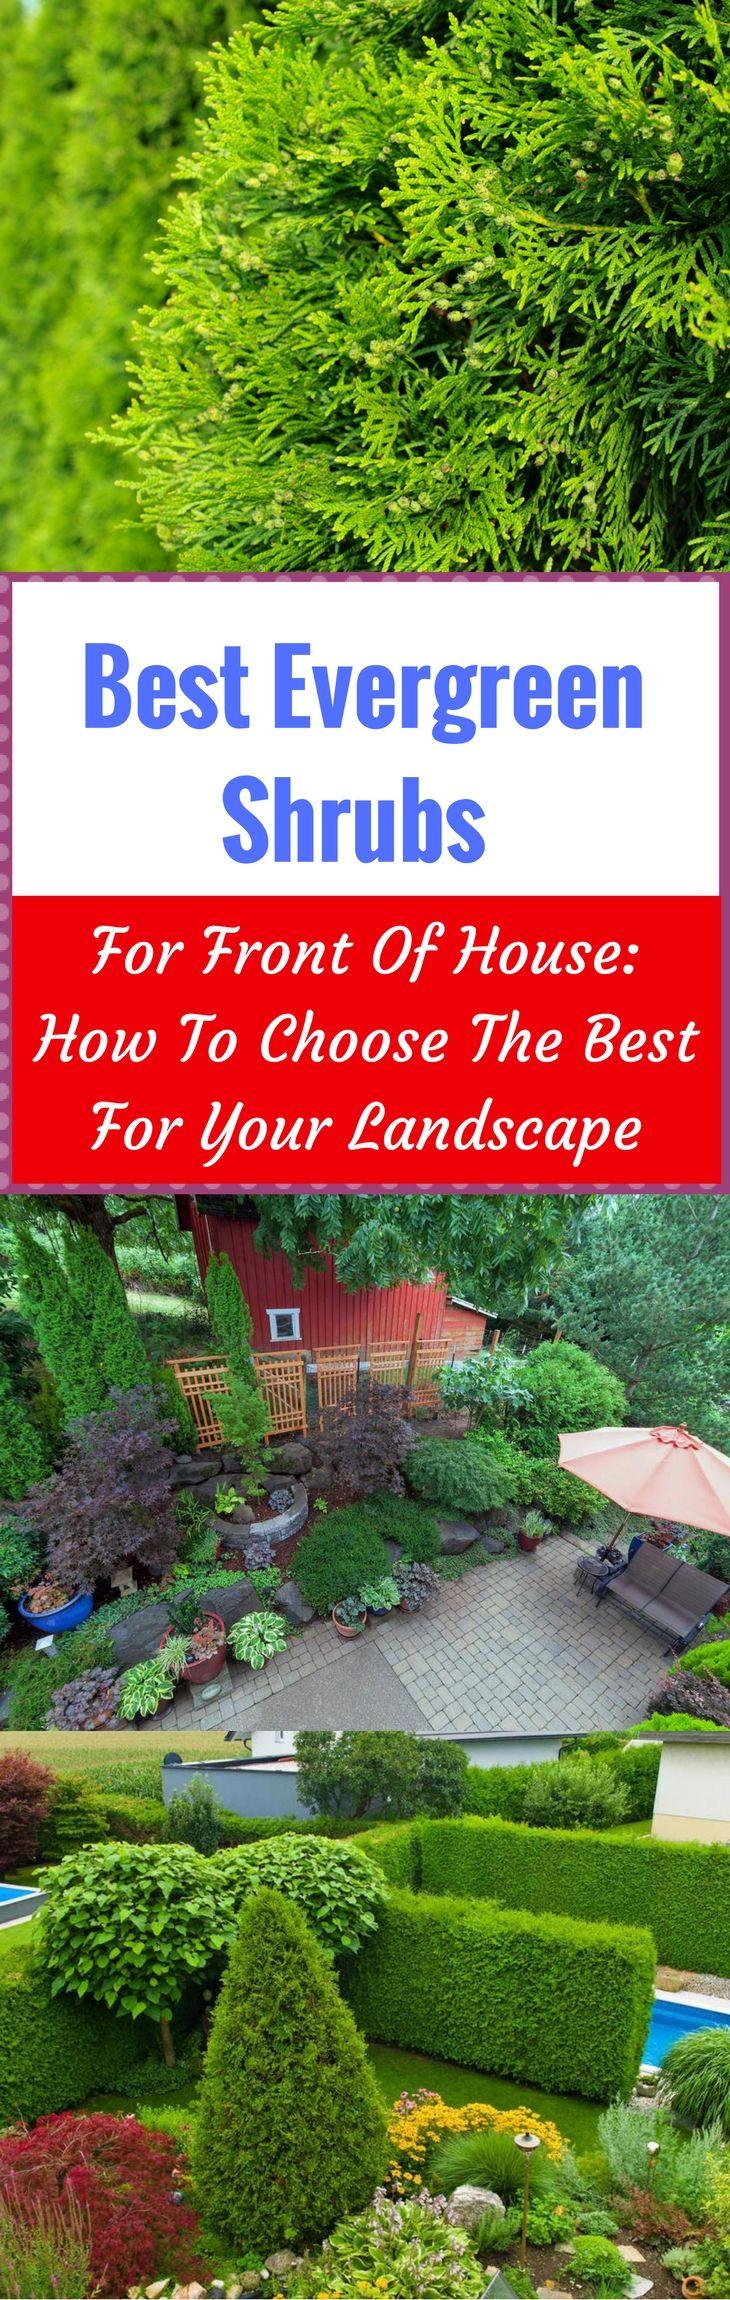 best 25 evergreen shrubs ideas on pinterest shrubs winter